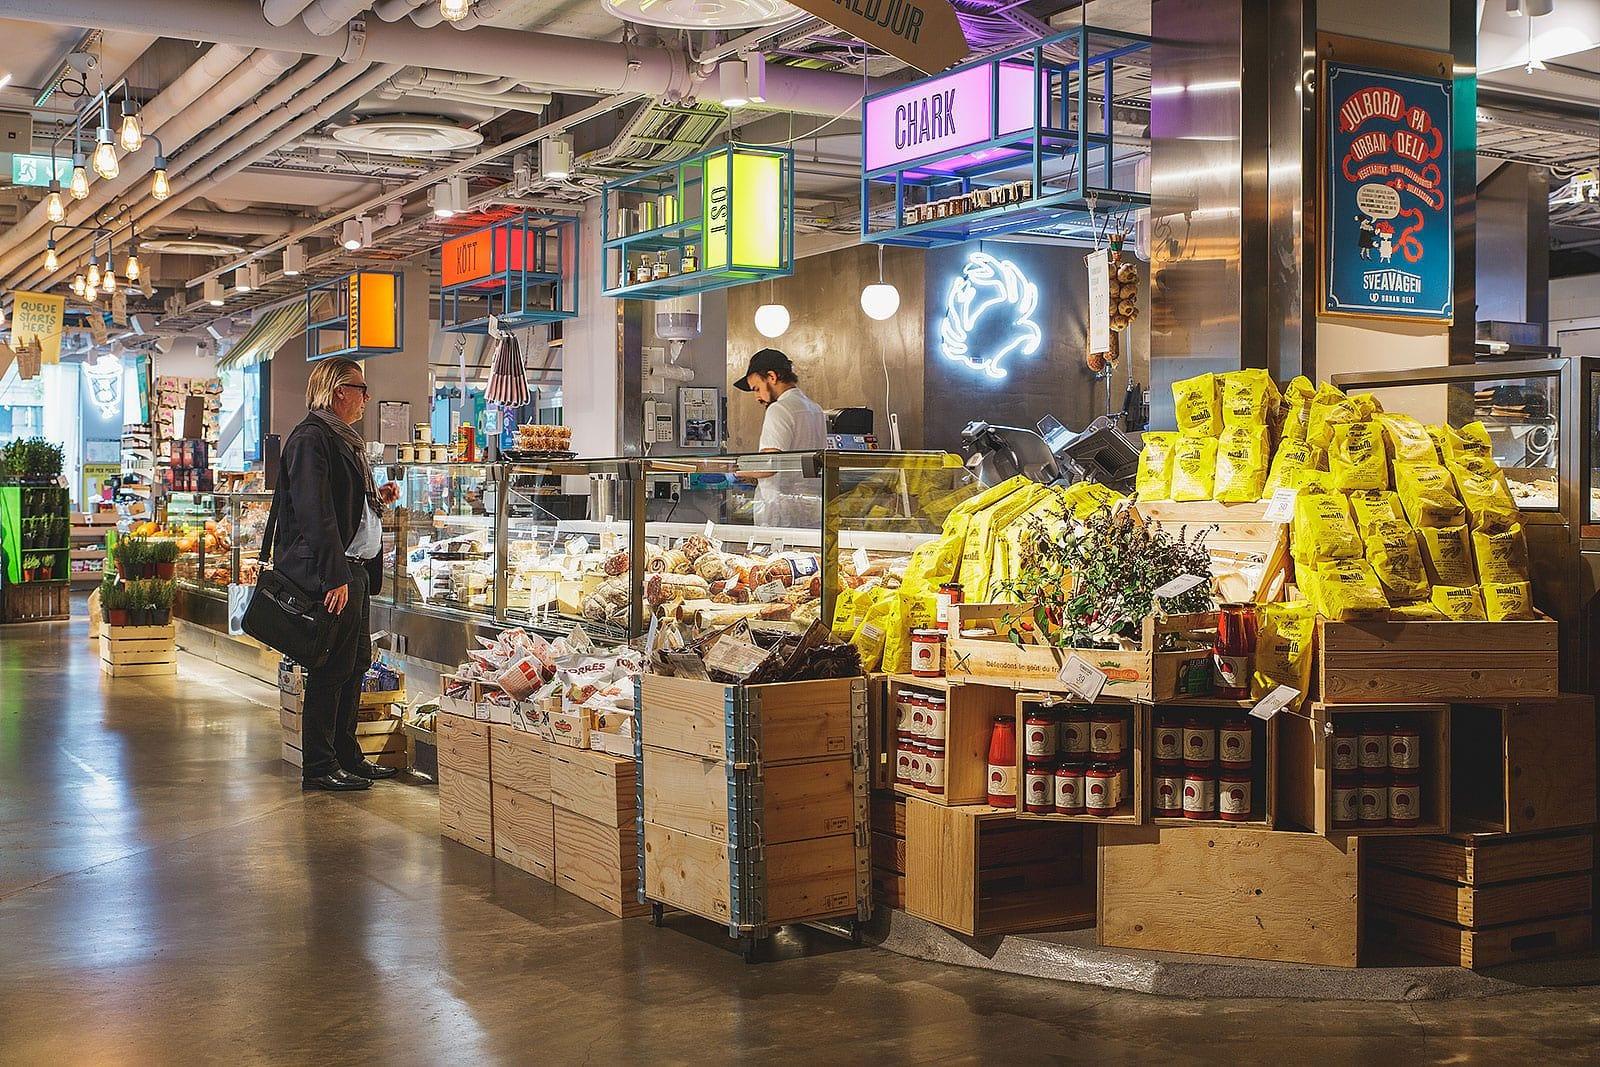 Arabisk Livsmedelsbutik Stockholm